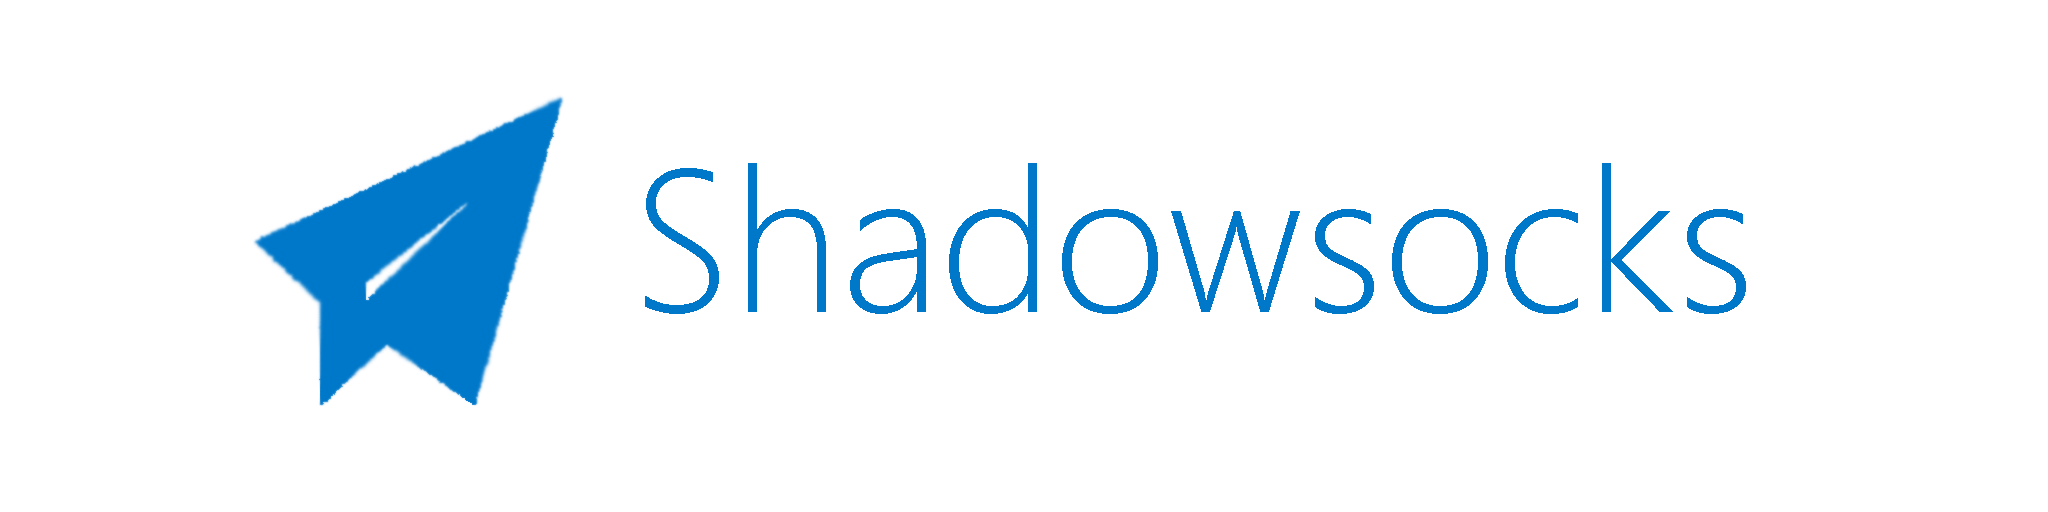 shadowsocks-logo.png